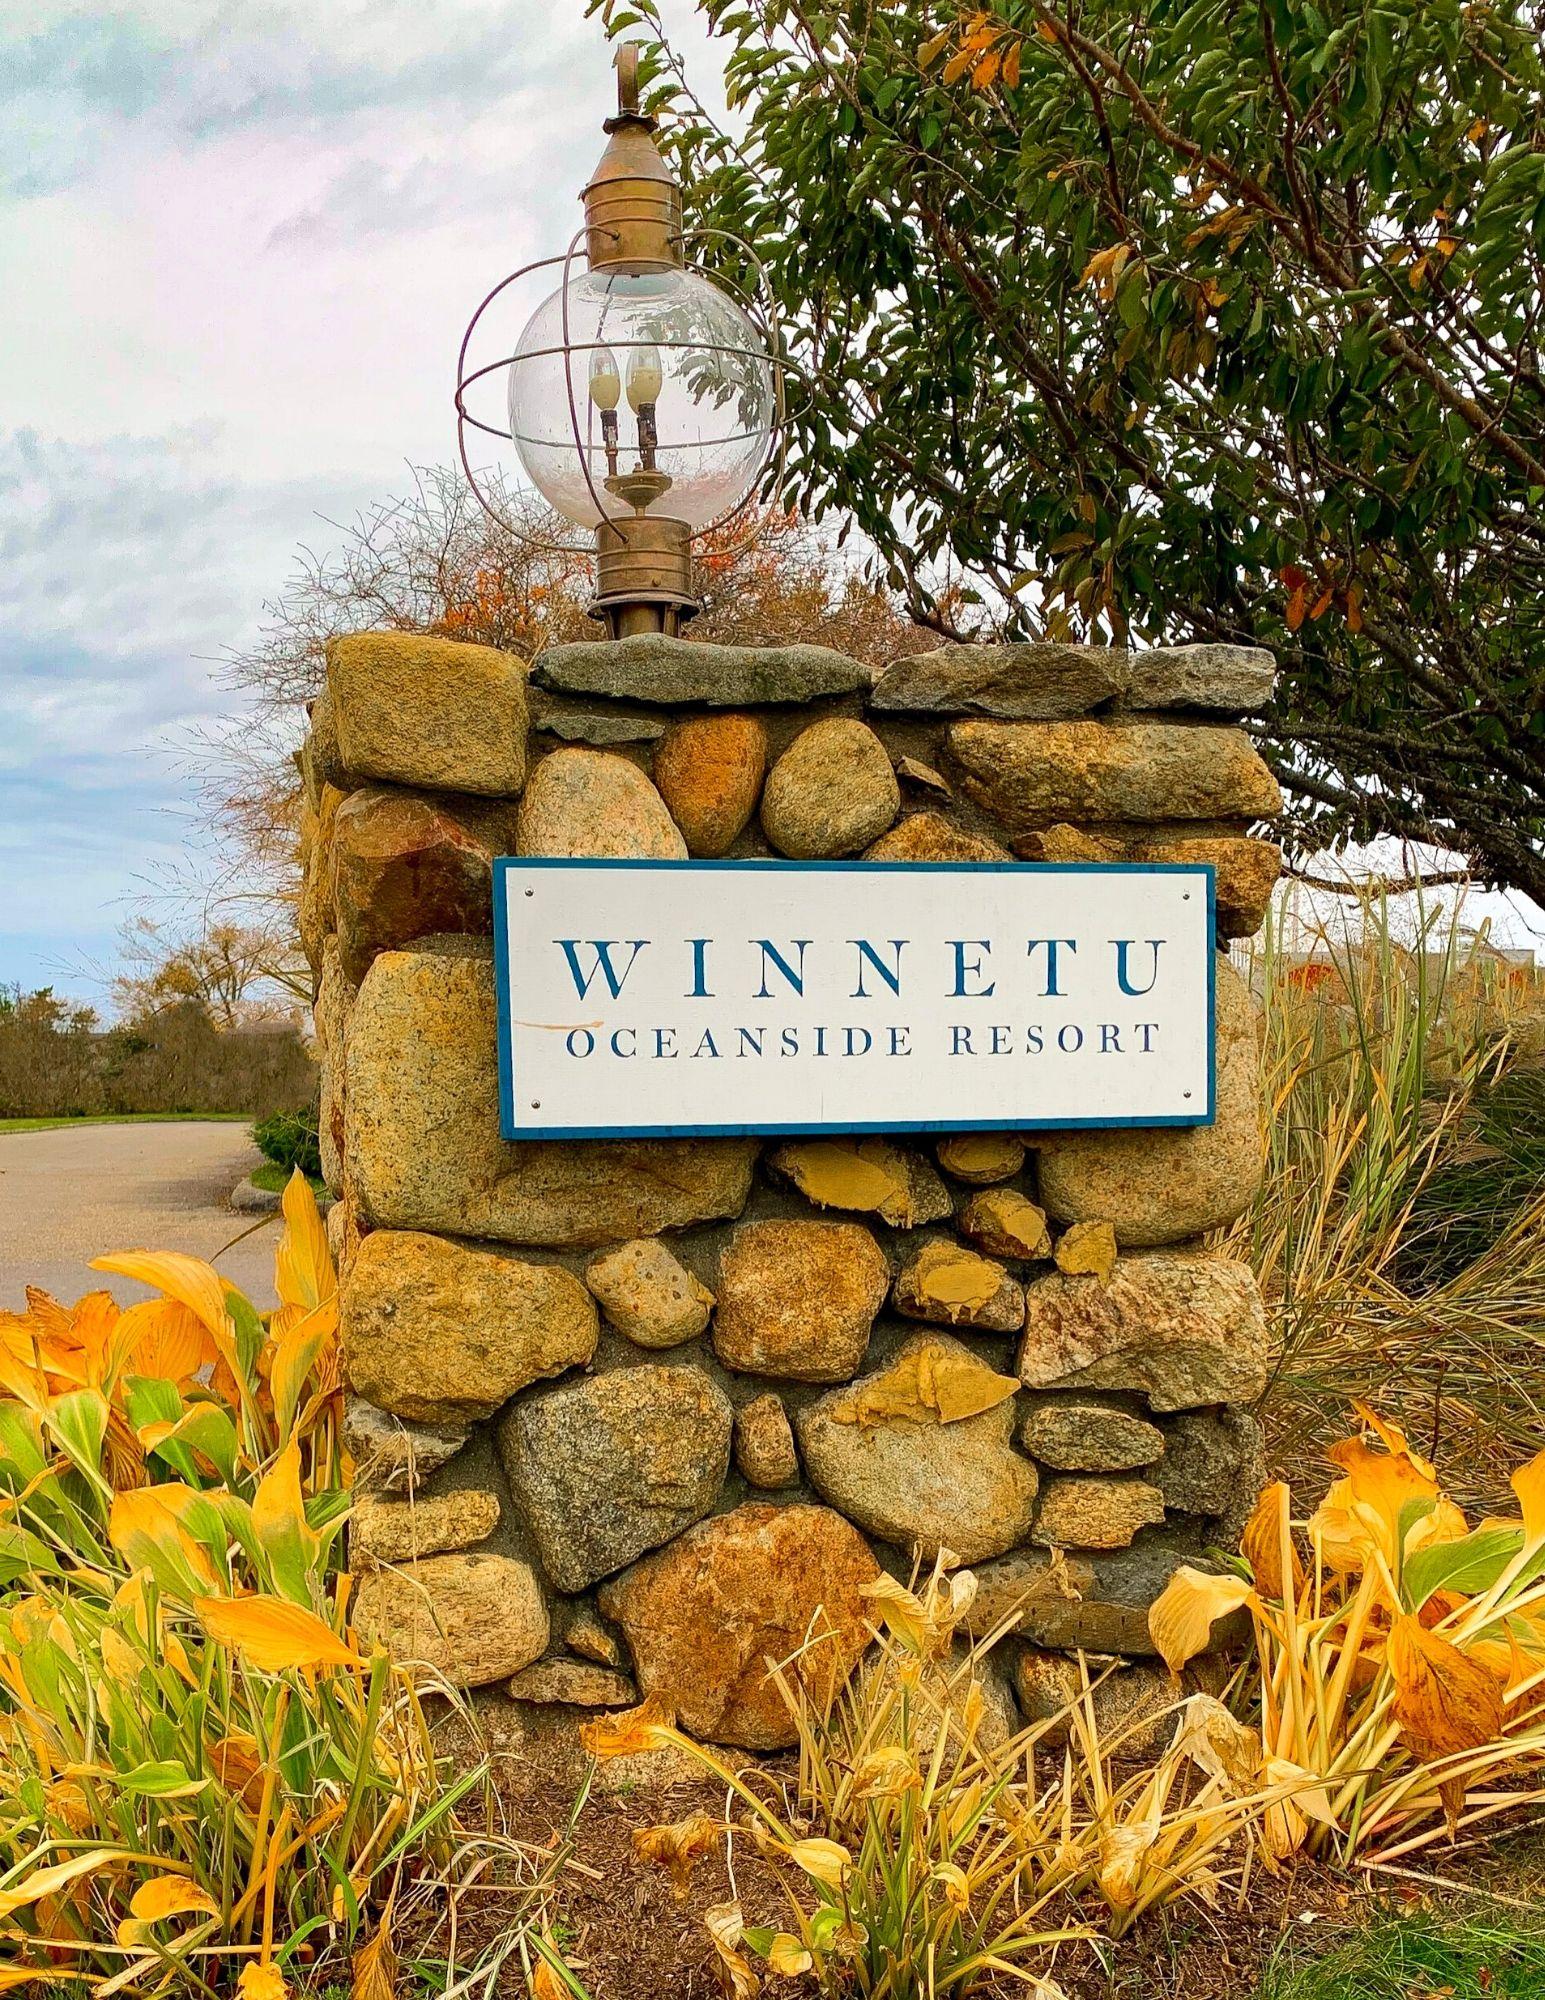 The Winnetu Oceanside Resort in Marthas Vineyard-12